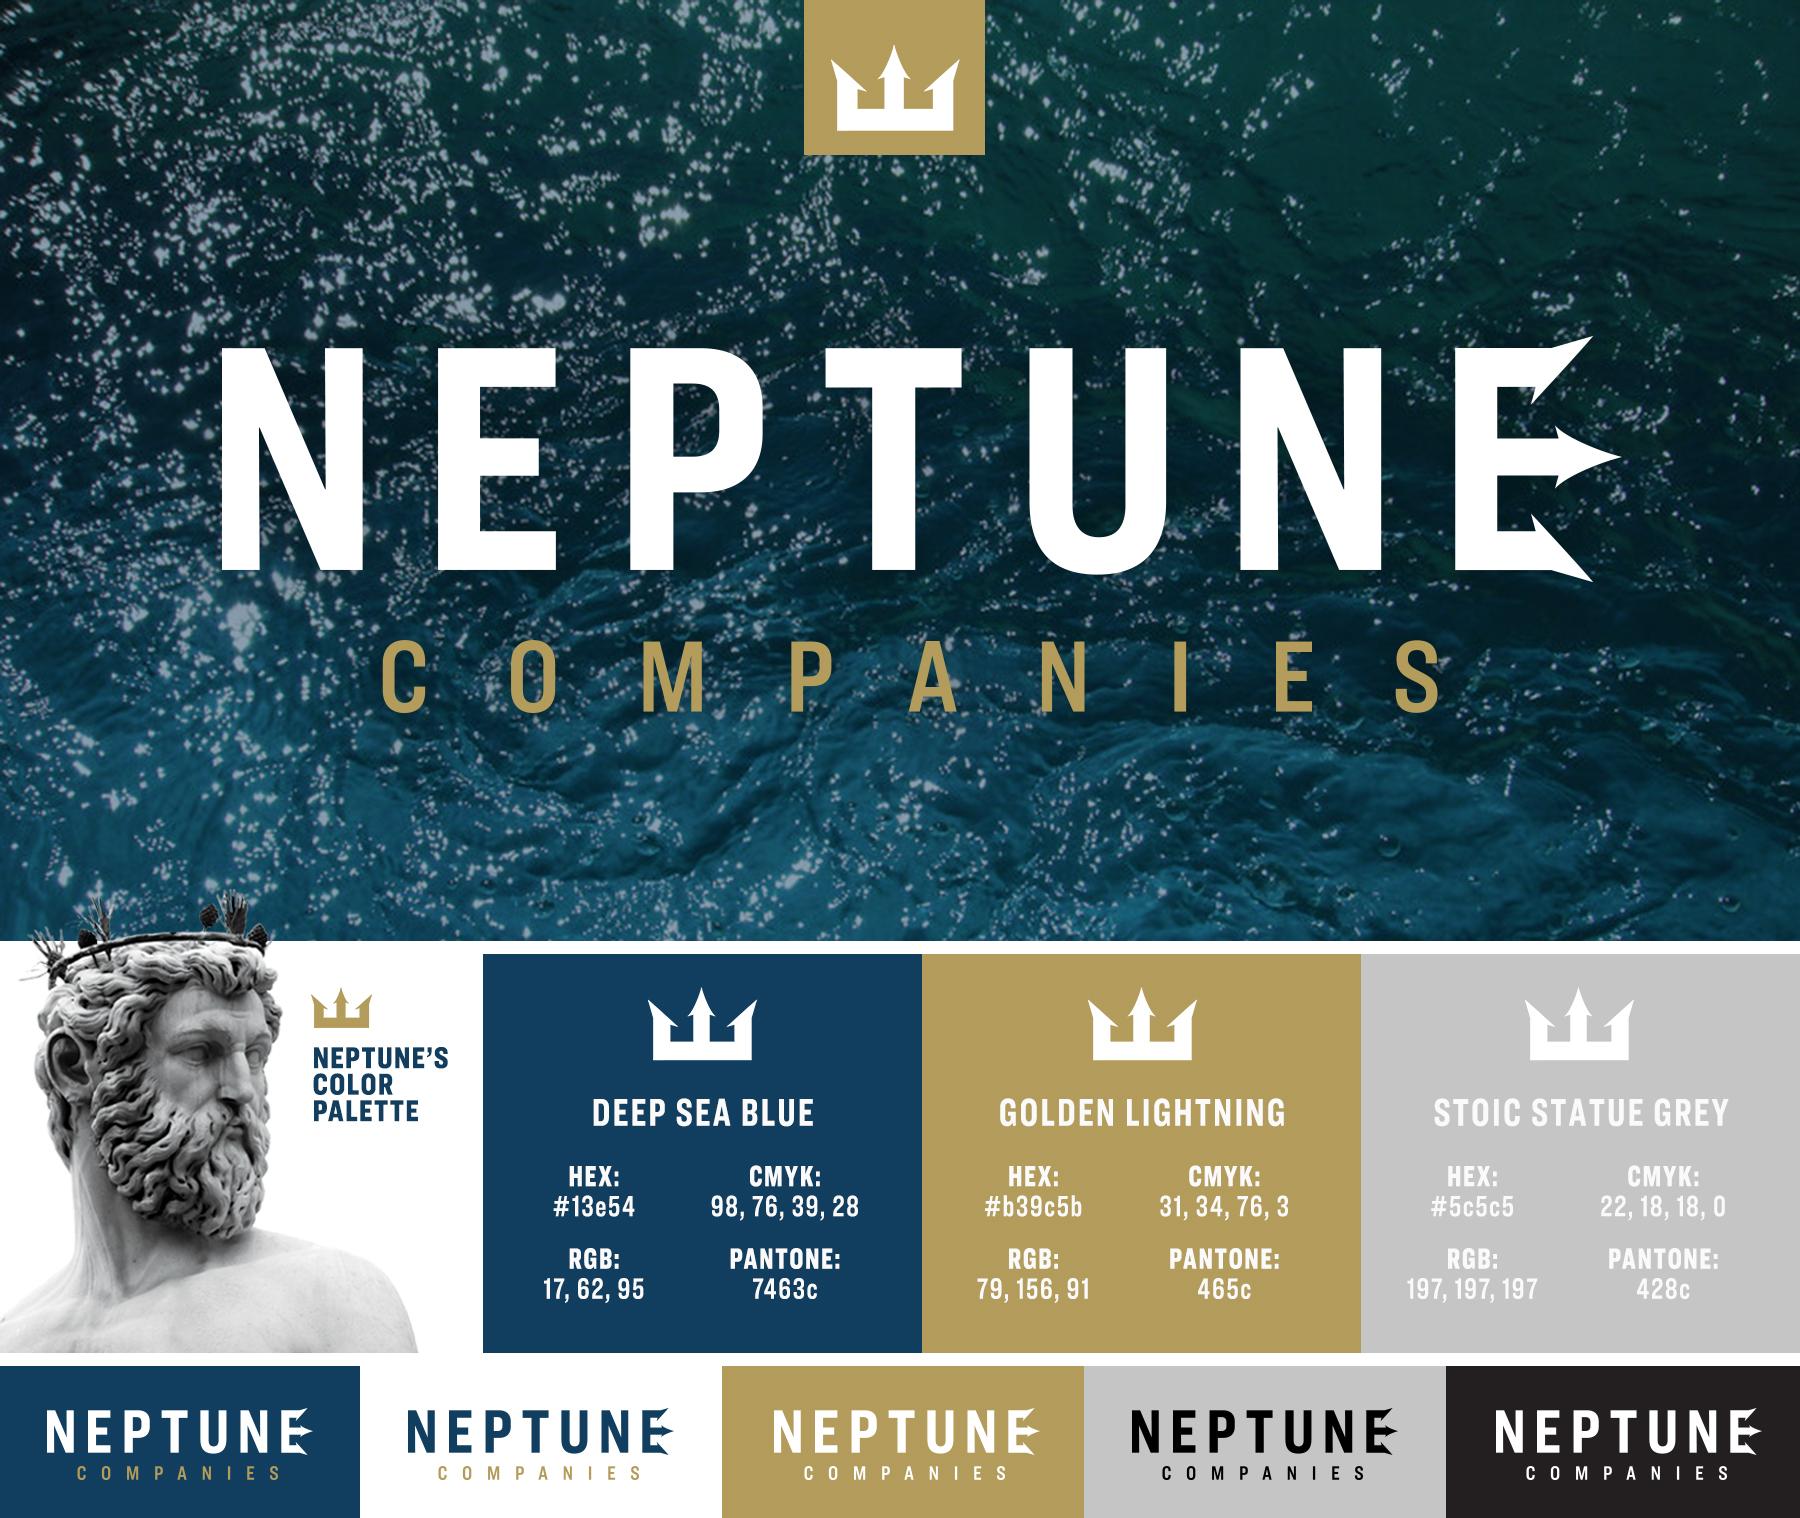 Neptune Companies' Color Palette